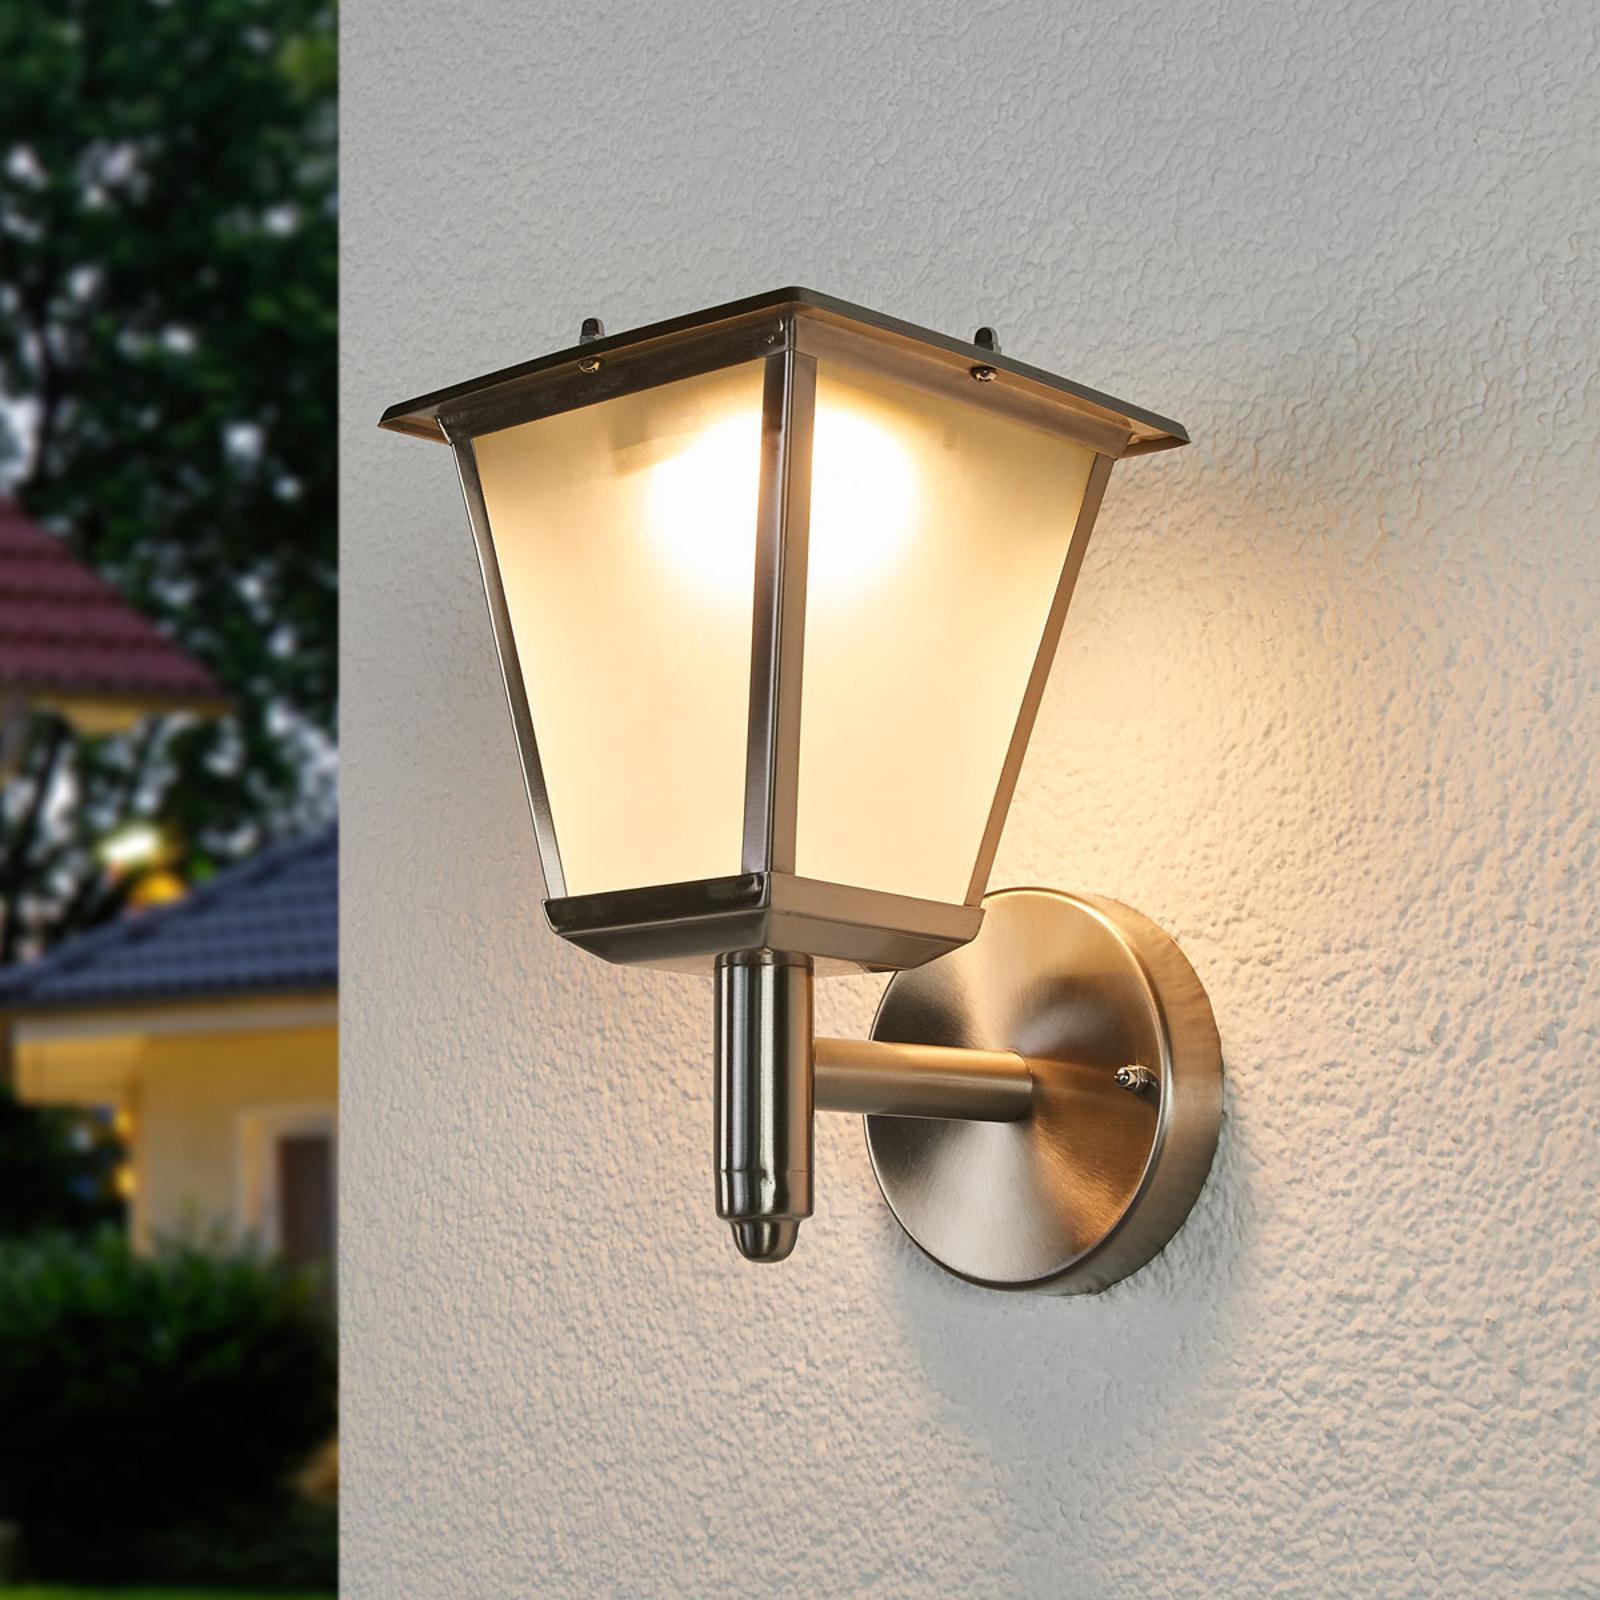 Buitenwandlamp Anica op zonne-energie LED's, rvs